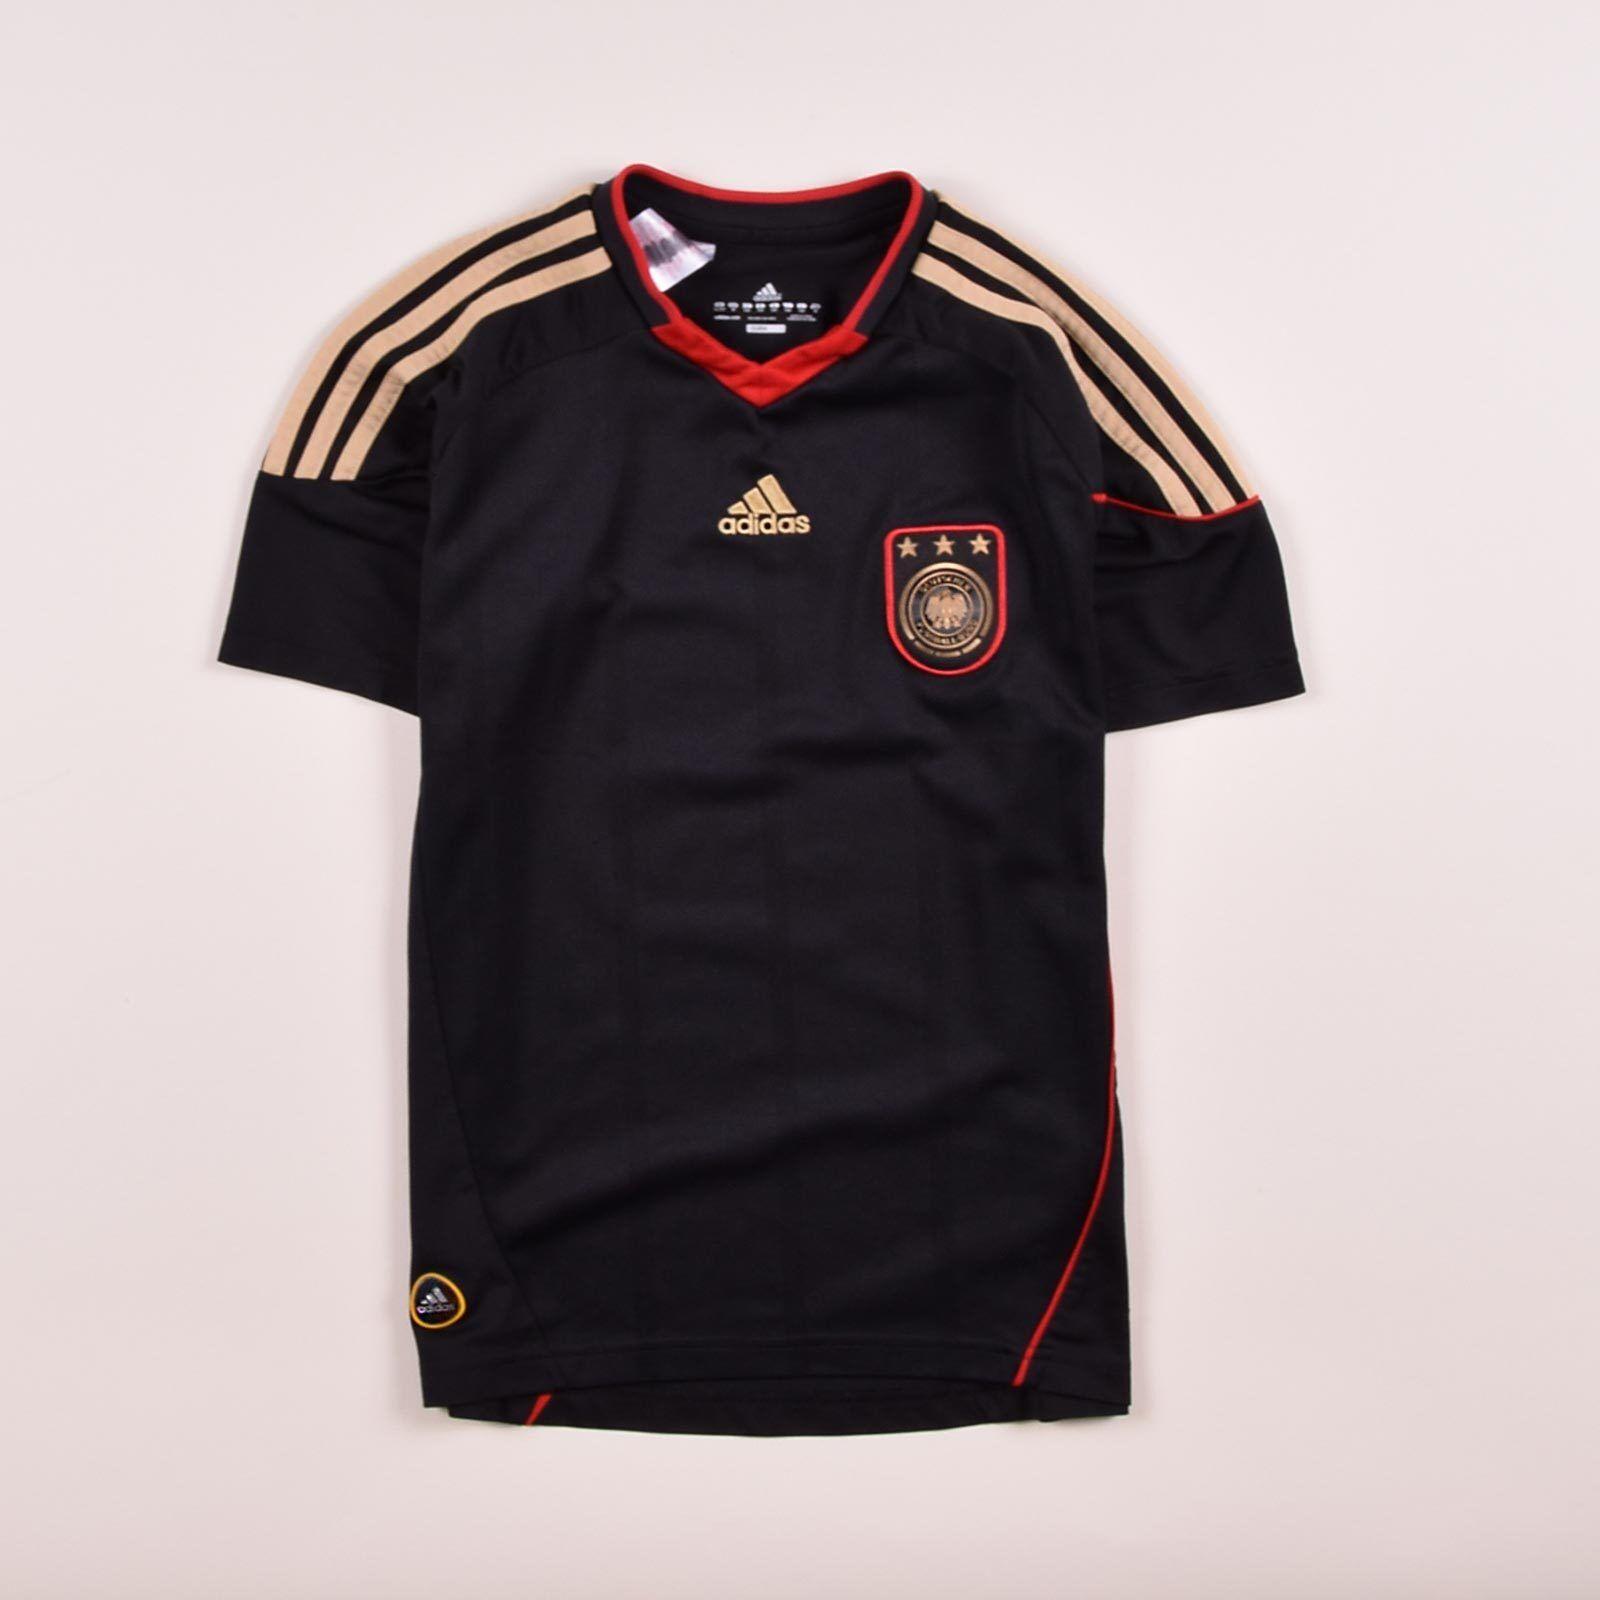 Adidas Junge Kinder Trikot Jersey Gr.152 DFB Deutschland 2010 black, 52713